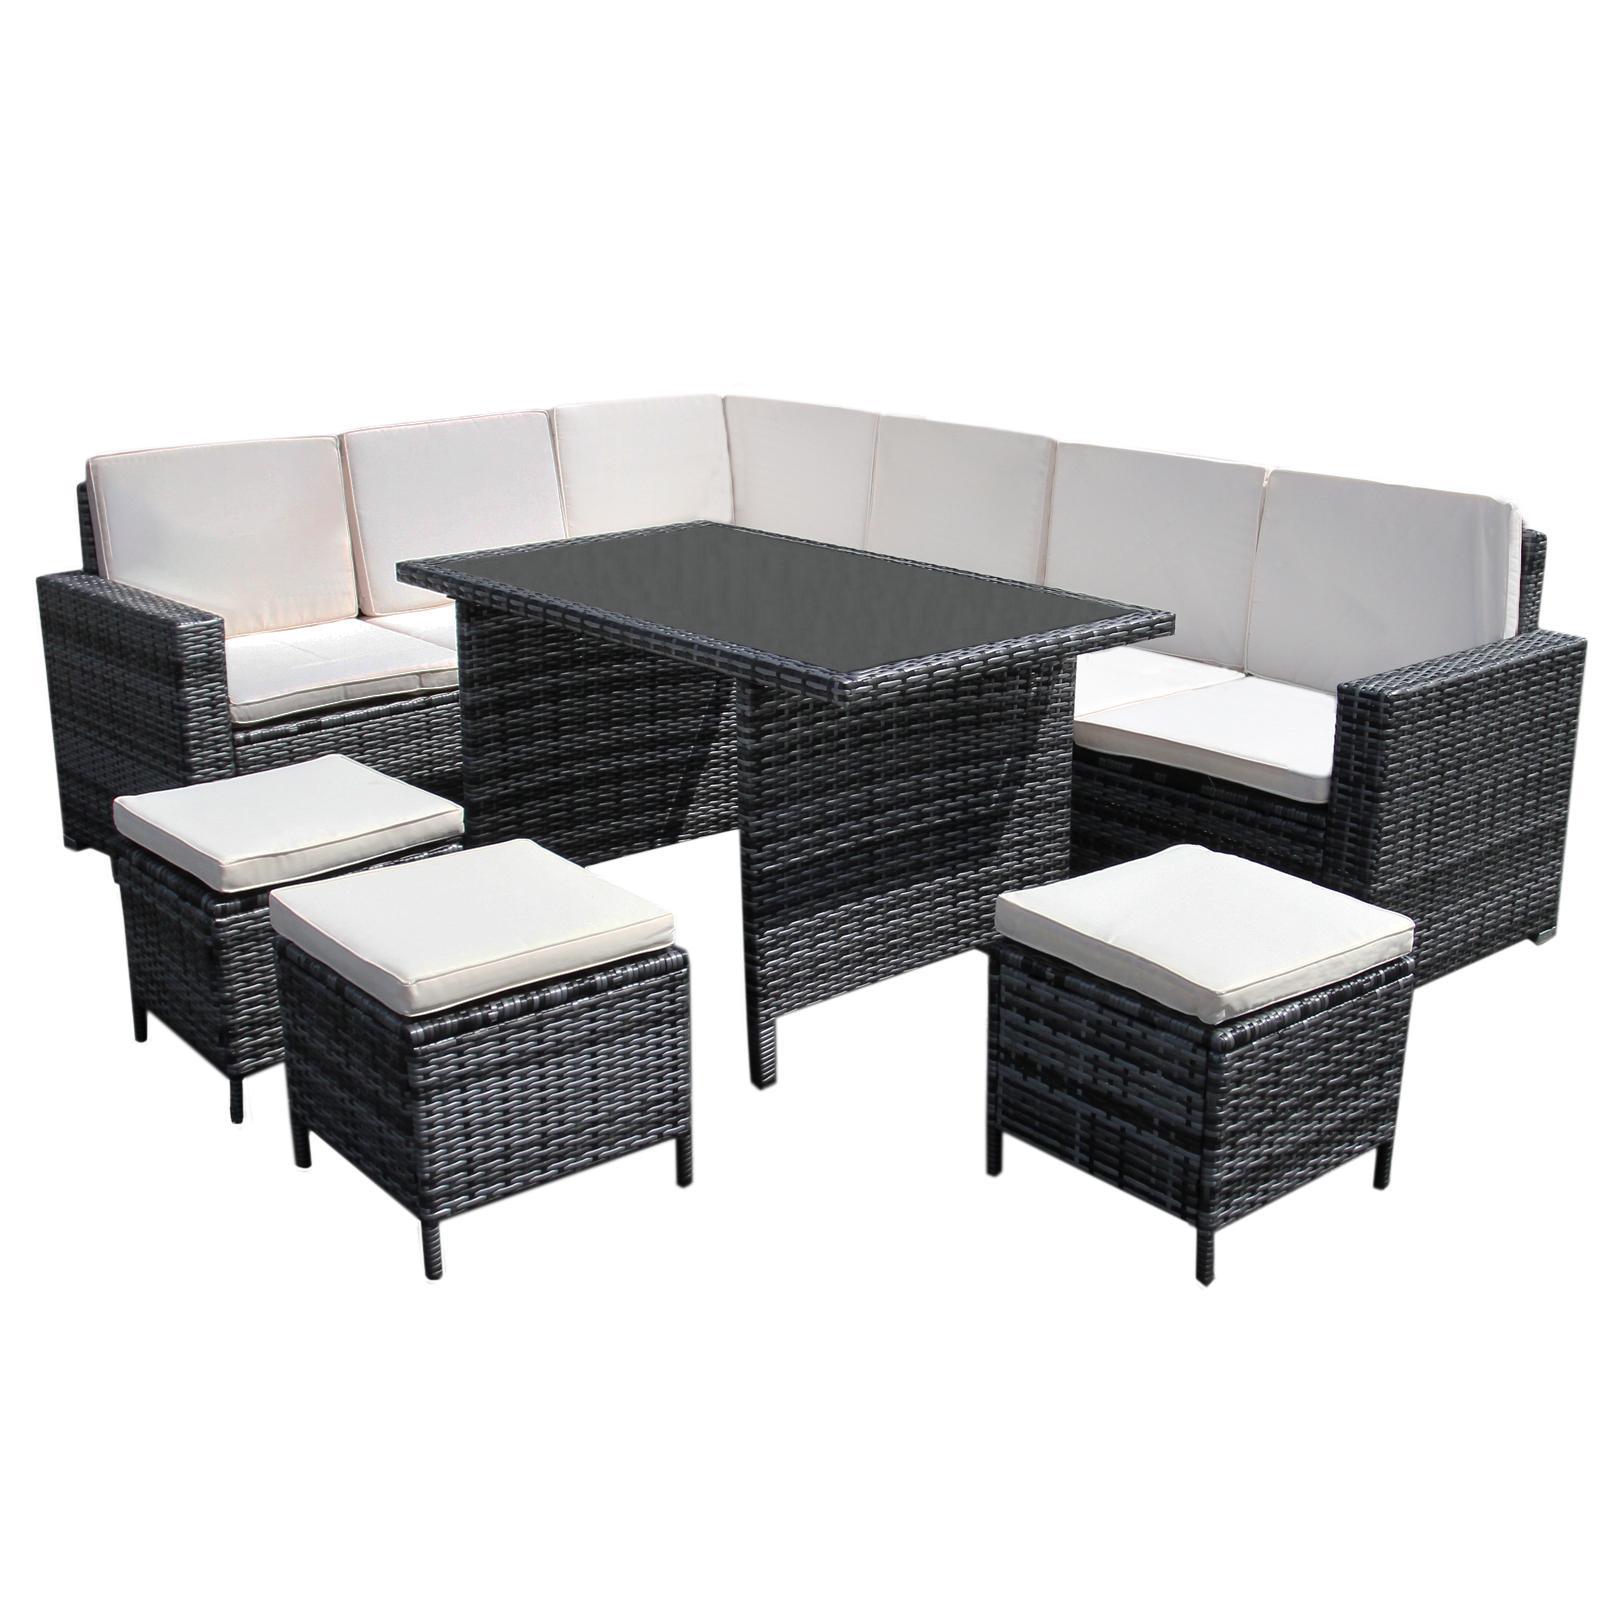 Full Size of Polyrattan Sofa Outdoor Garden Set Ausziehbar Tchibo Couch Grau Gartensofa 2 Sitzer Lounge Rattan 2 Sitzer Balkon 5d1e1e14b222b 3 1 Landhausstil Benz Mit Sofa Polyrattan Sofa